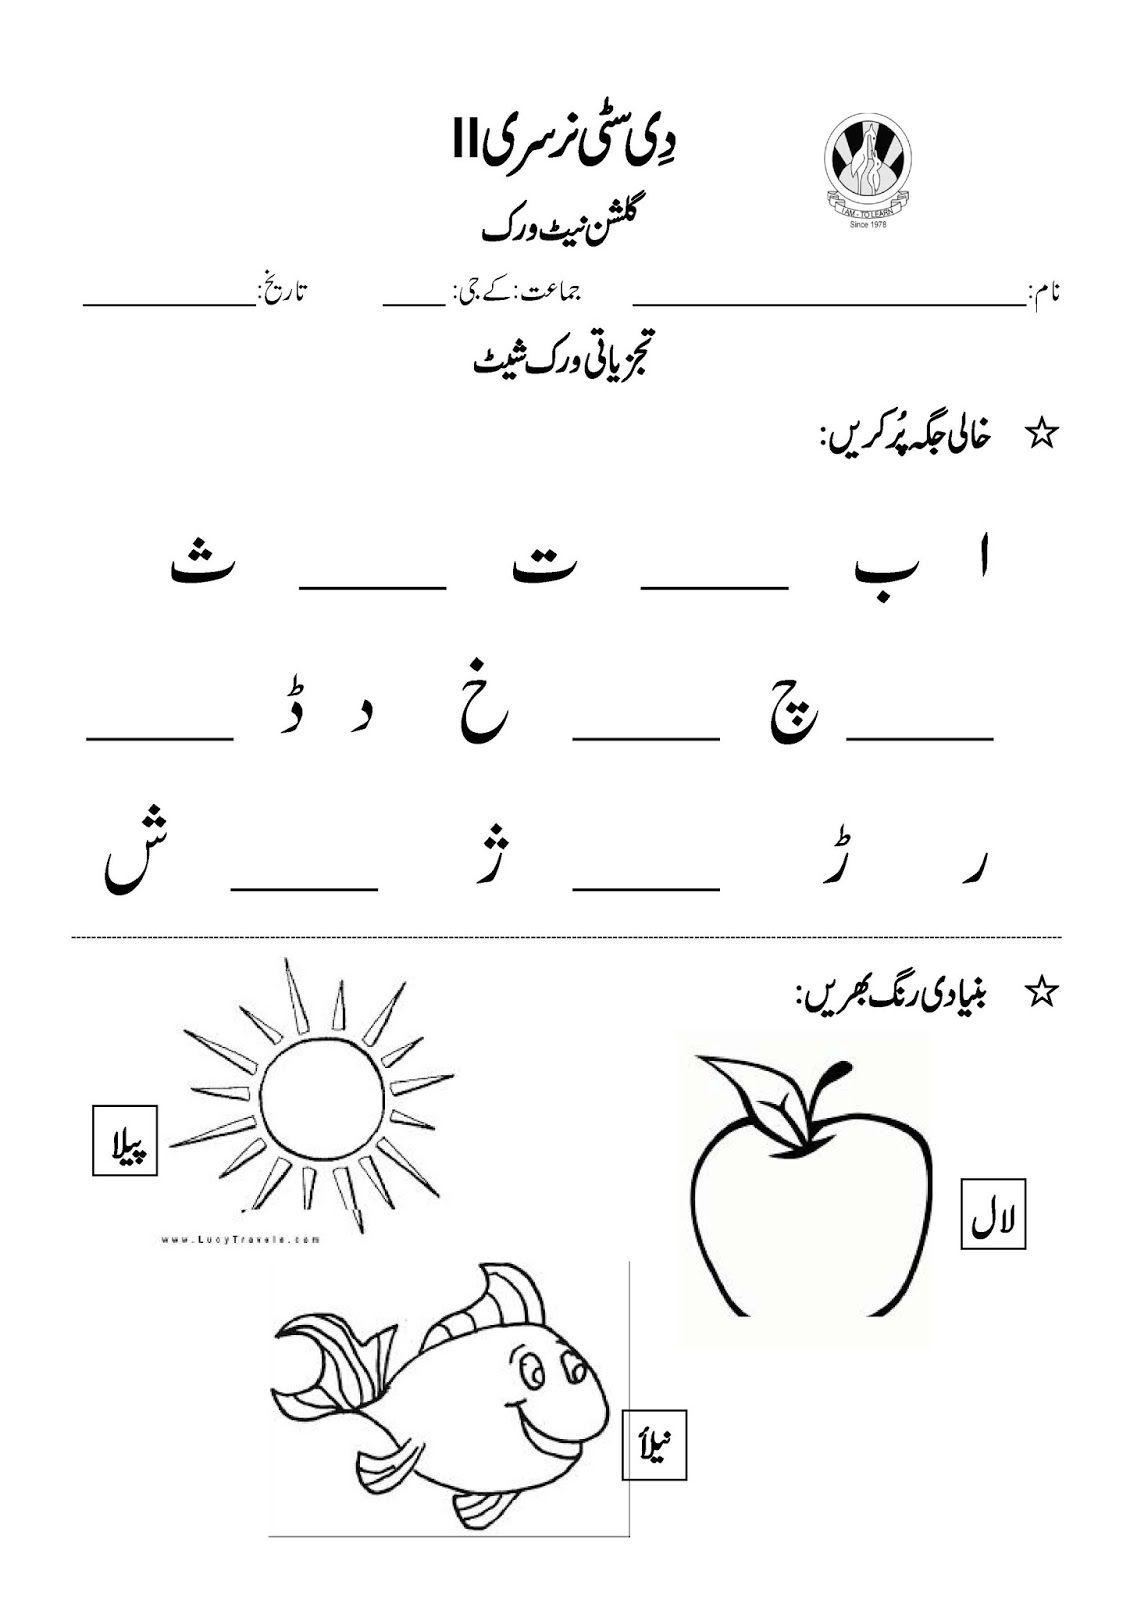 Urdu Alphabets Tracing Worksheets Printable